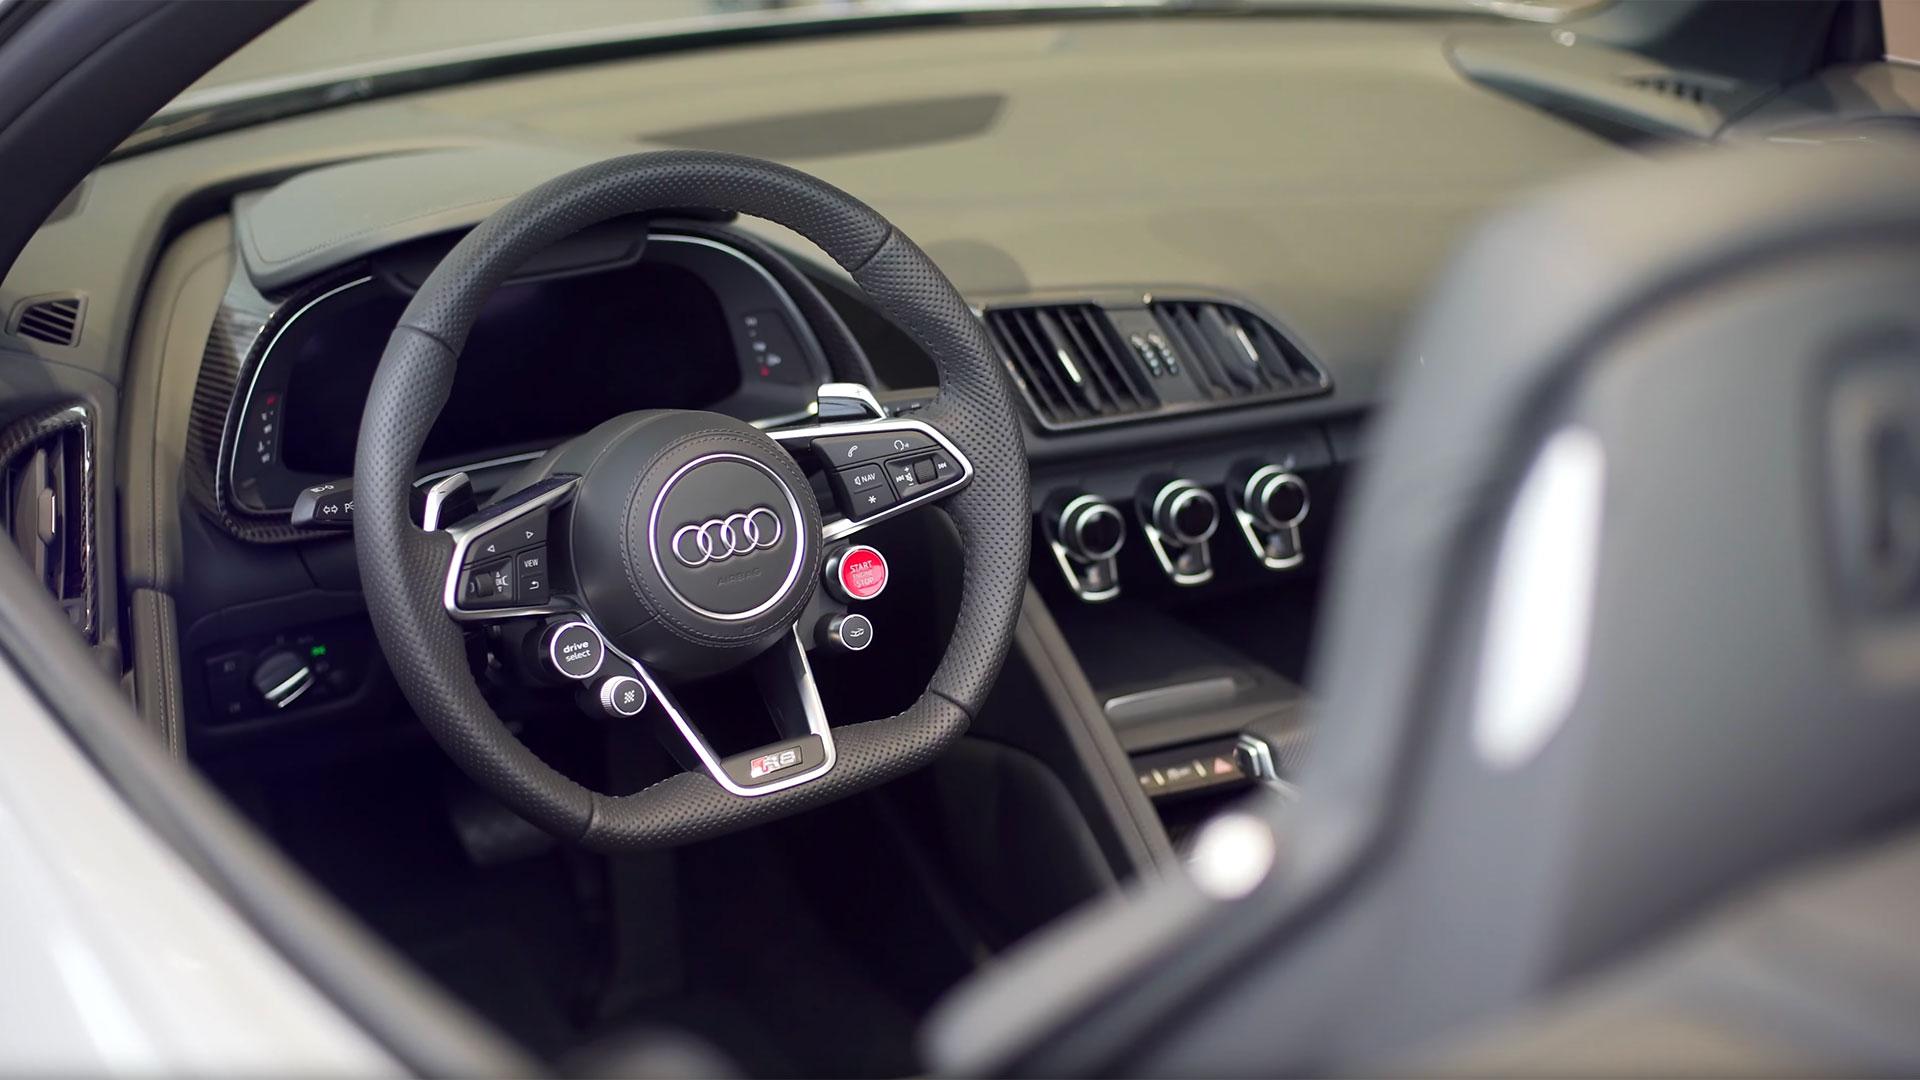 Audi R8 Martin Schilder Alkmaar